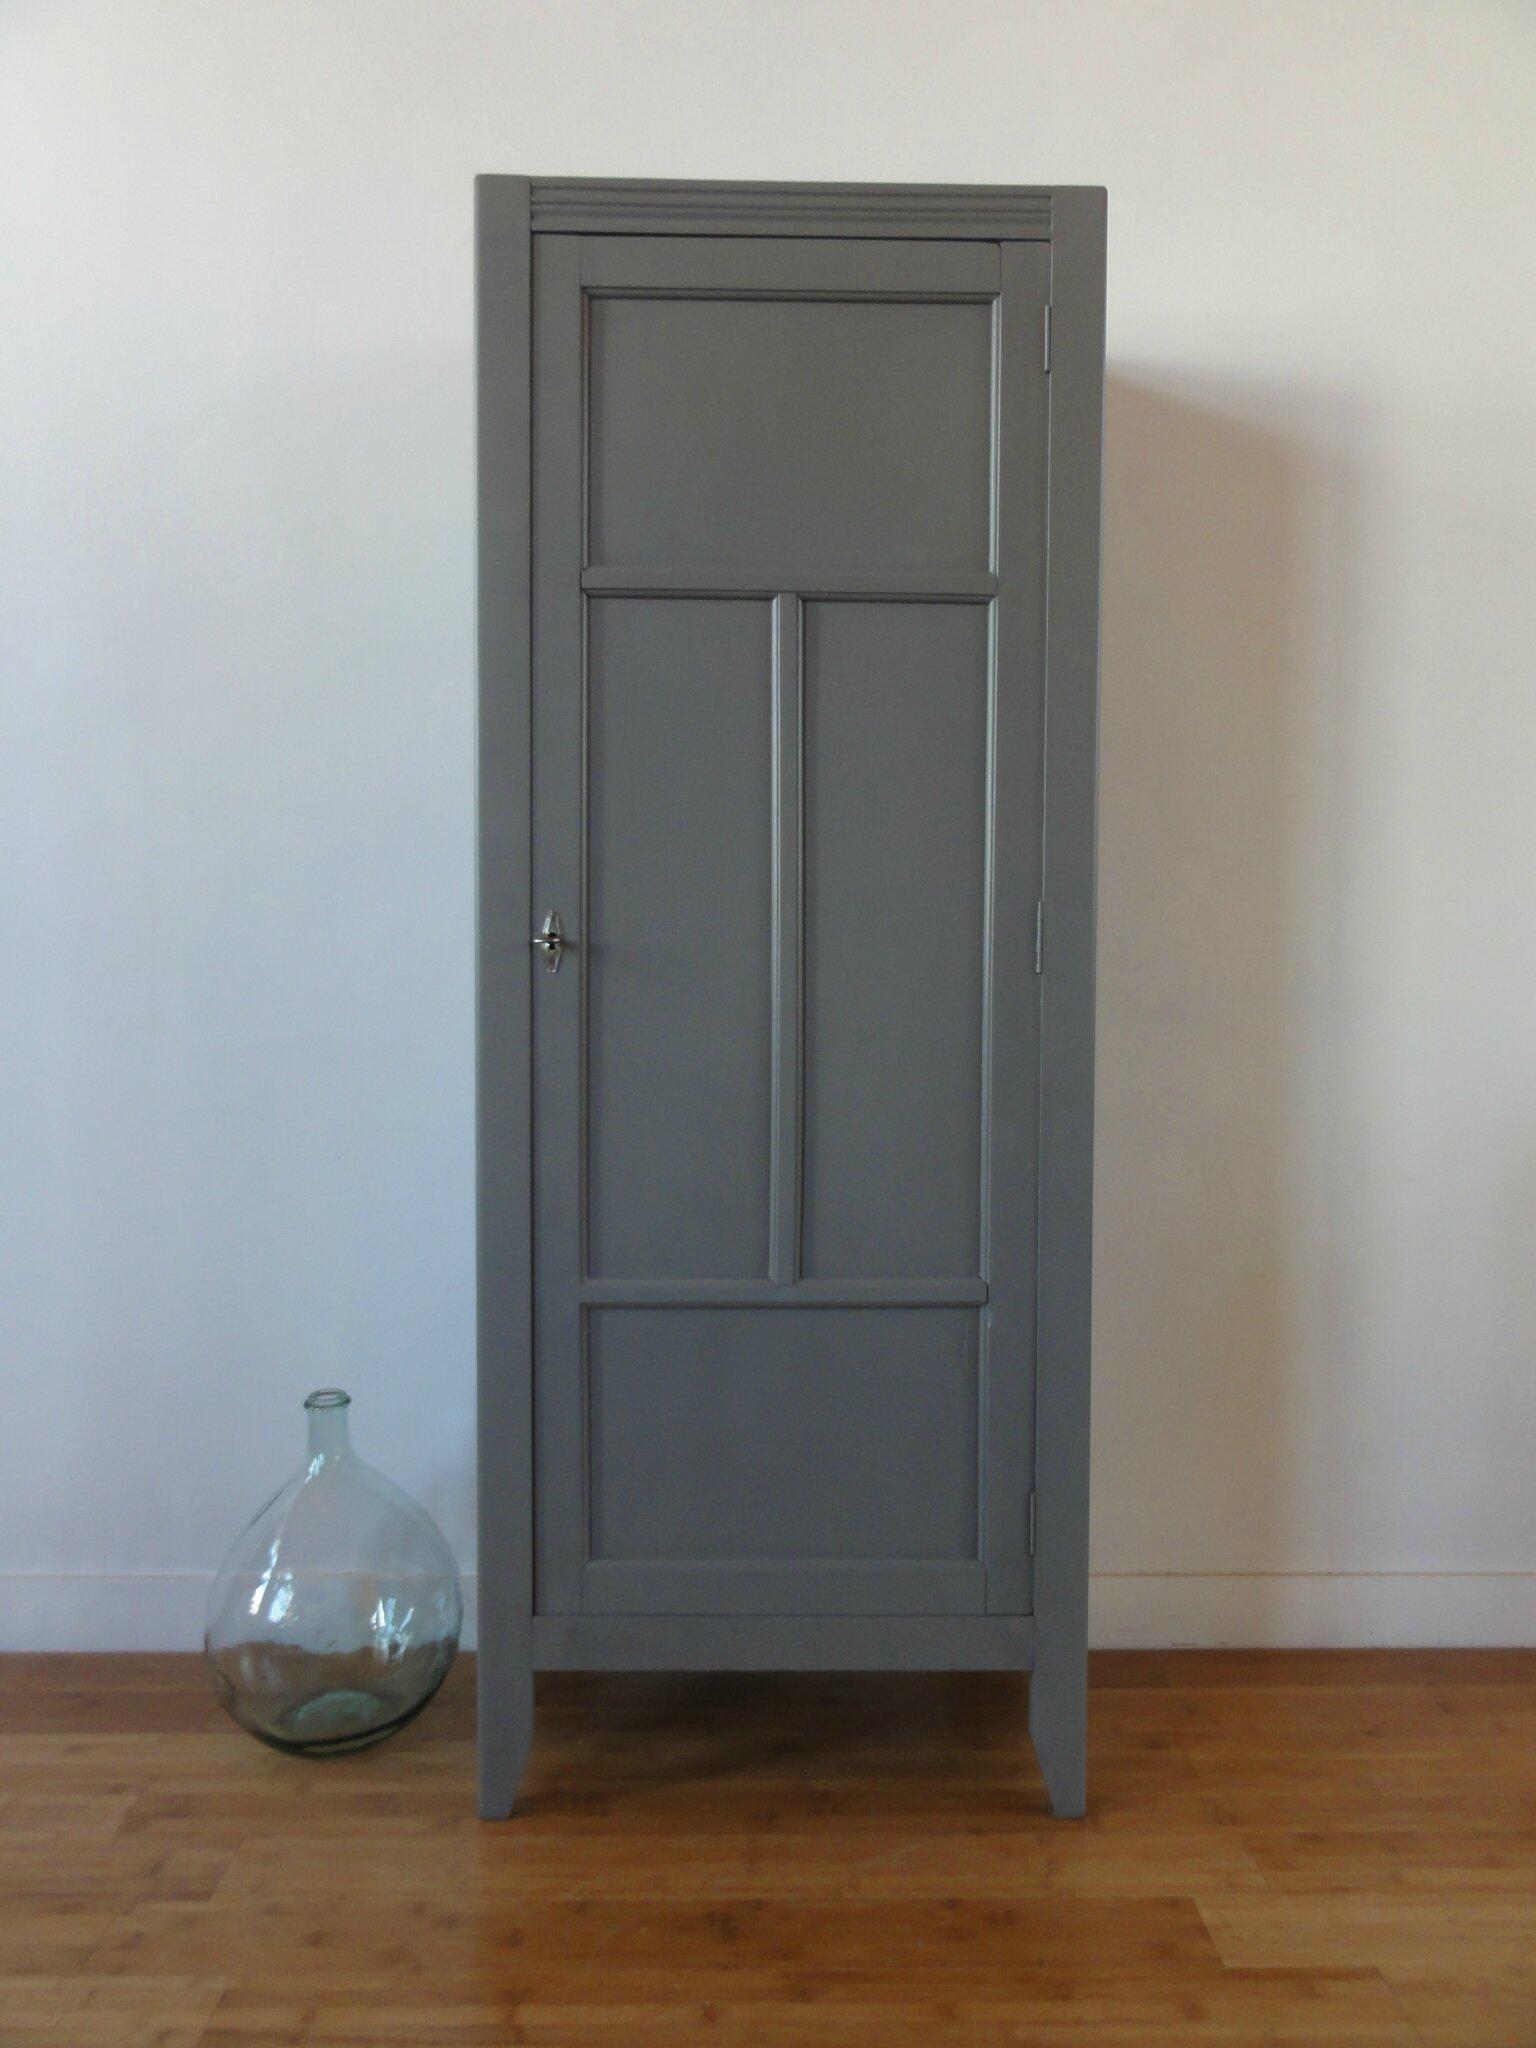 armoire parisienne annees 50 vintage emoi